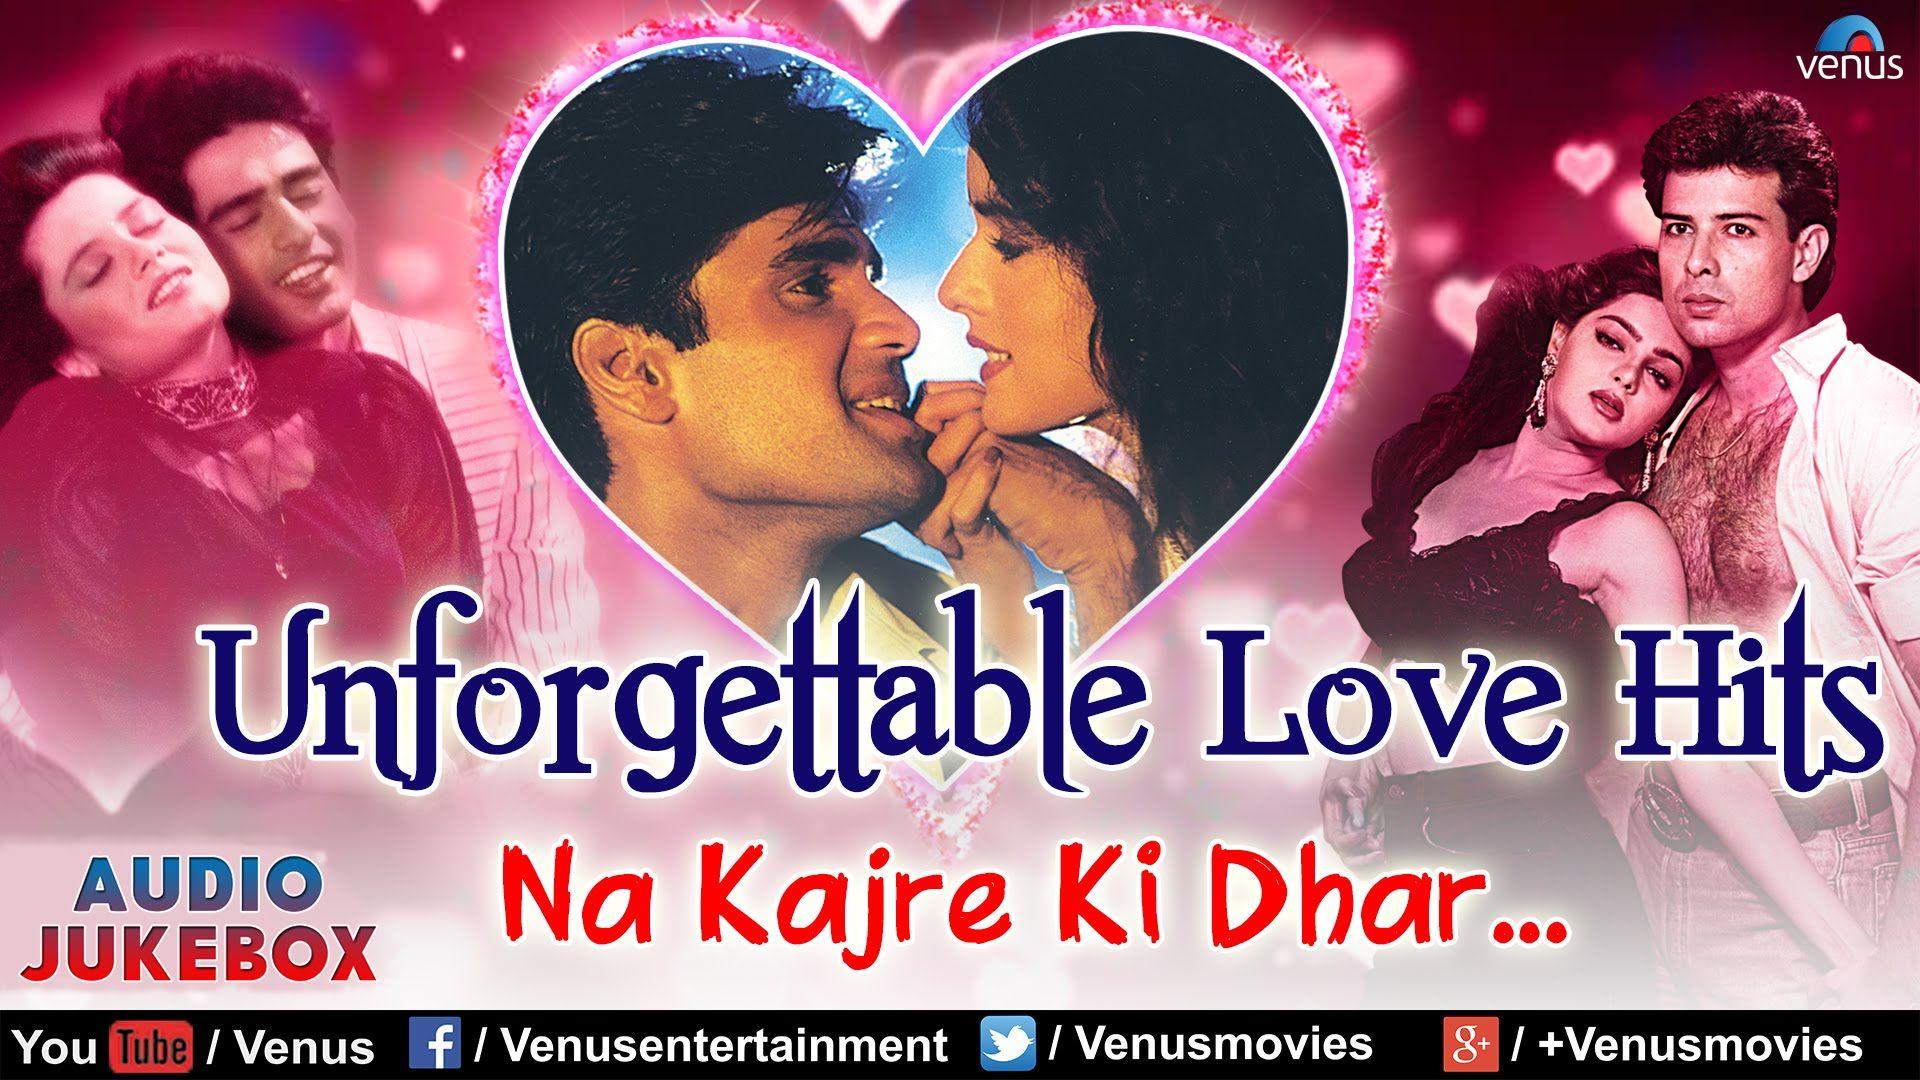 Unforgettable Love Hits Na Kajre Ki Dhar Romantic Songs Audio J Romantic Songs Best Love Songs Songs